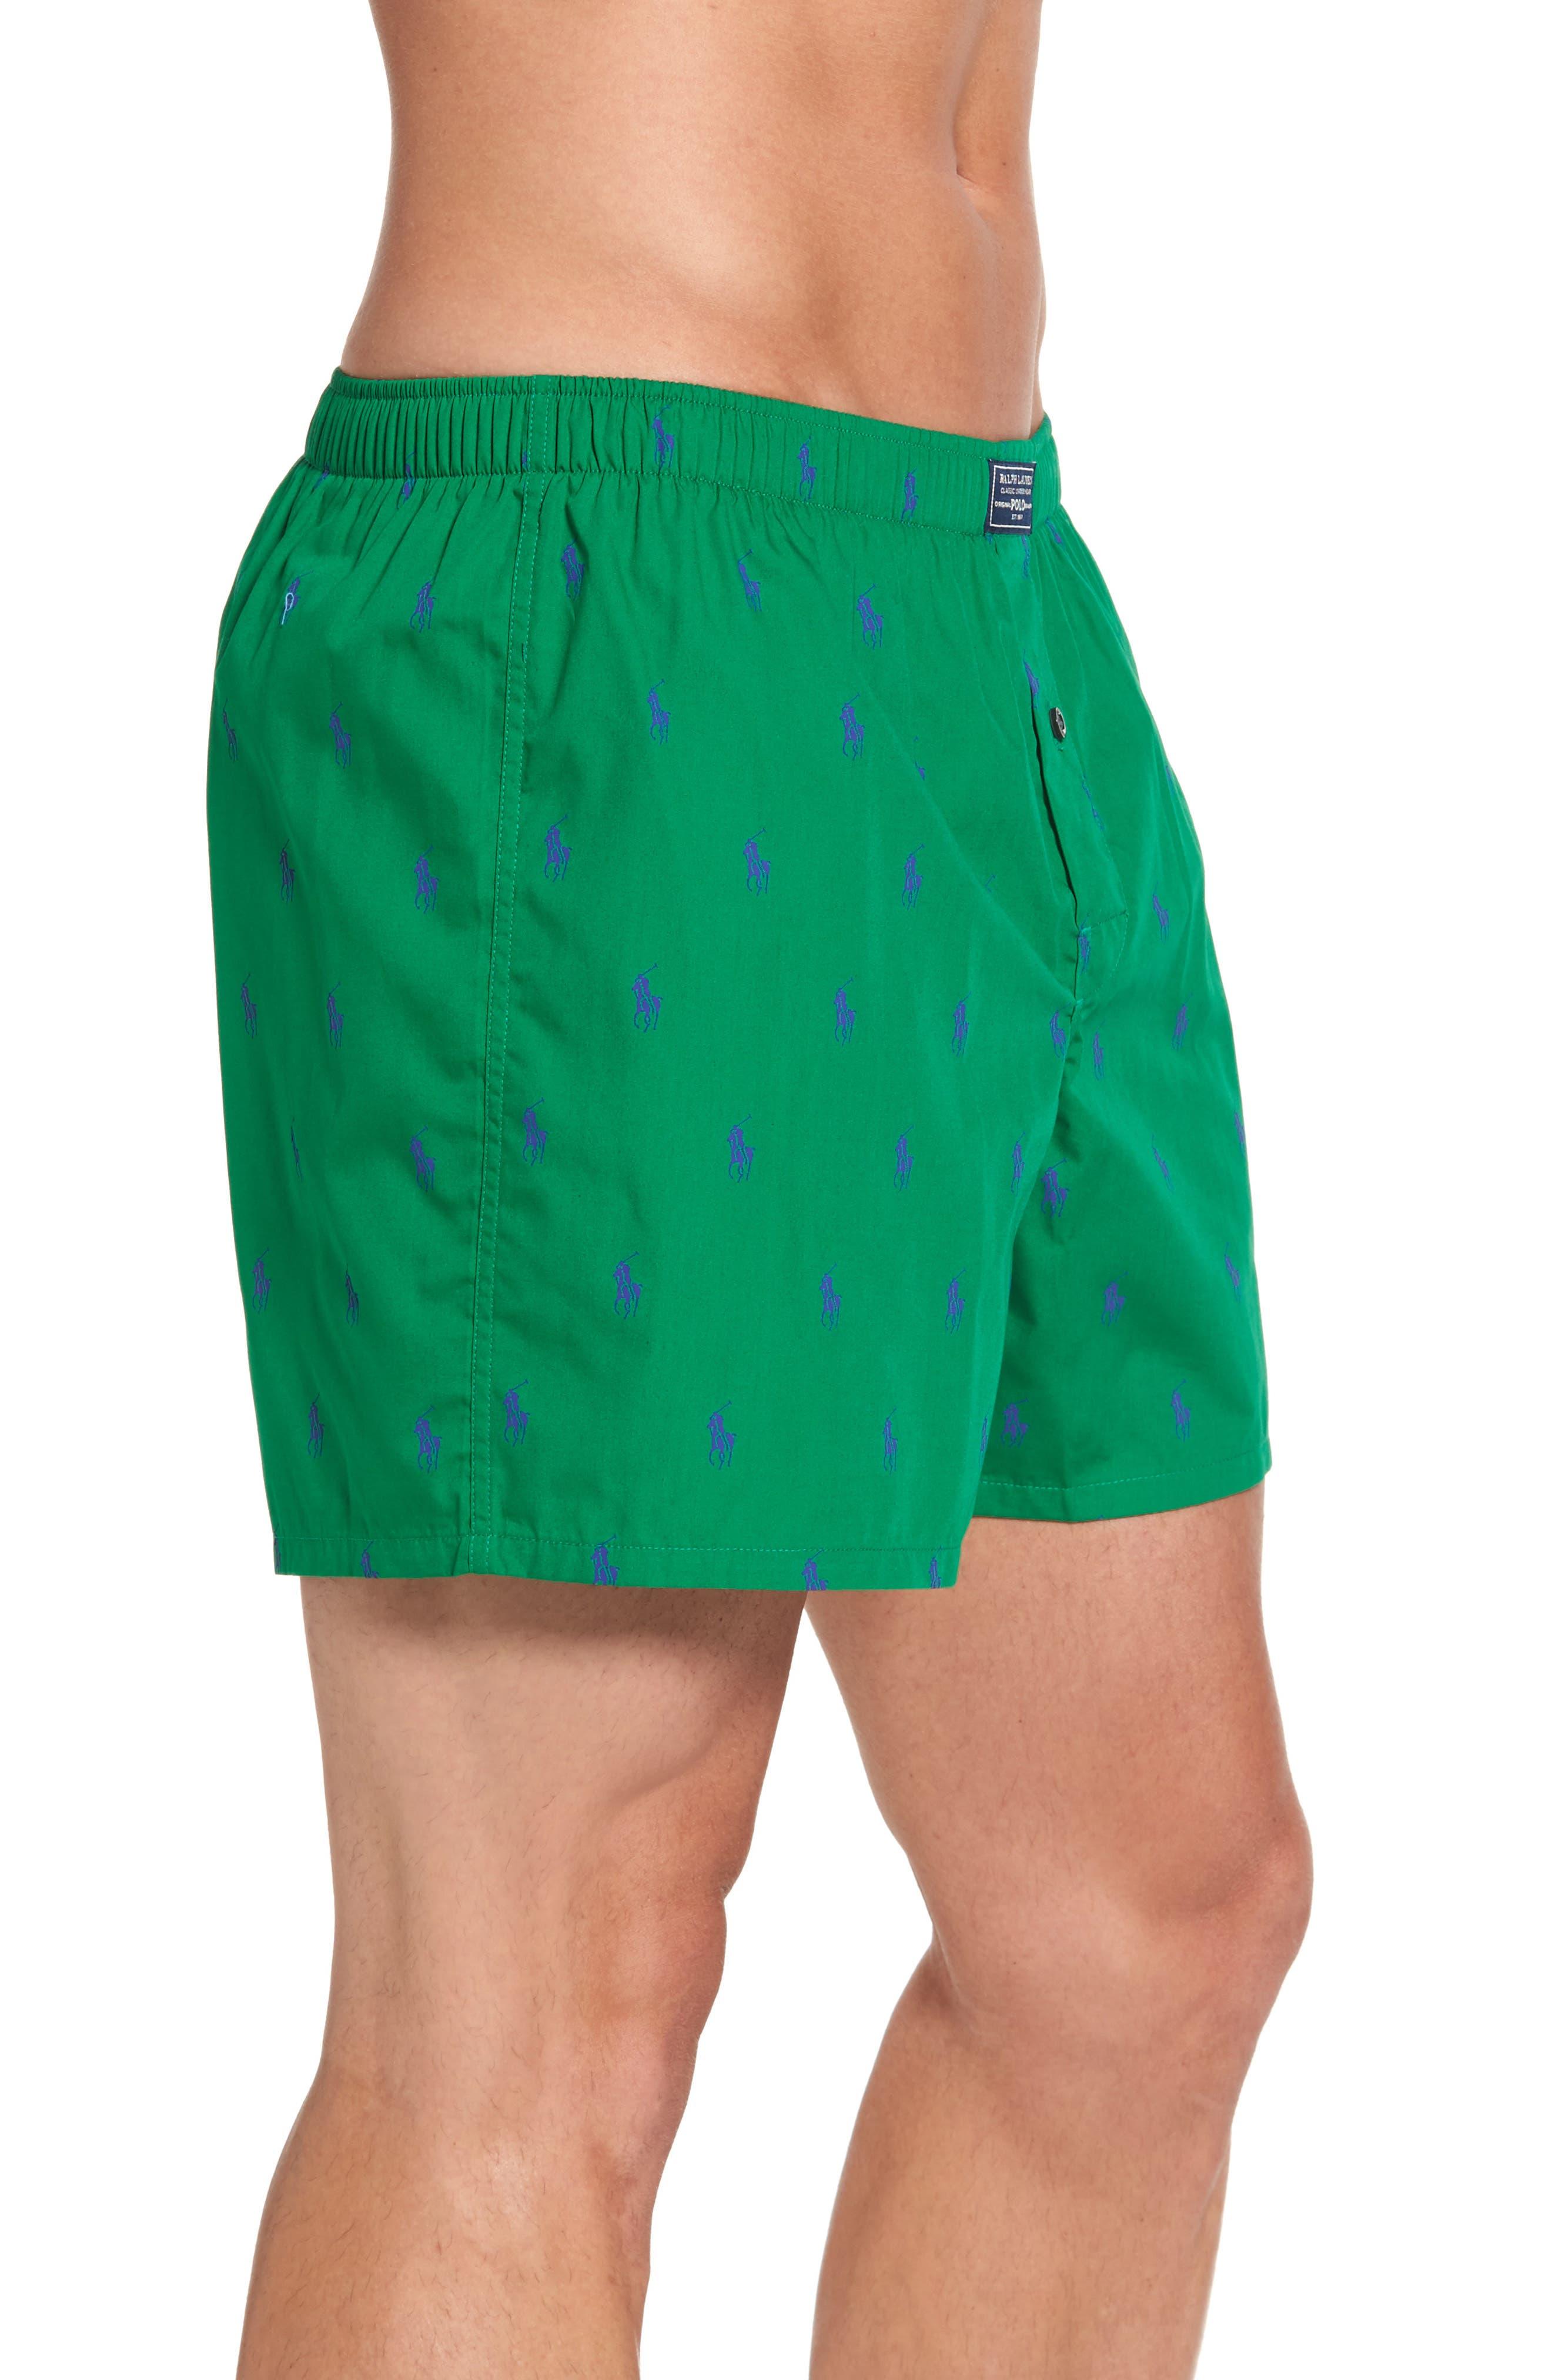 Pony Cotton Boxers,                             Alternate thumbnail 3, color,                             English Green